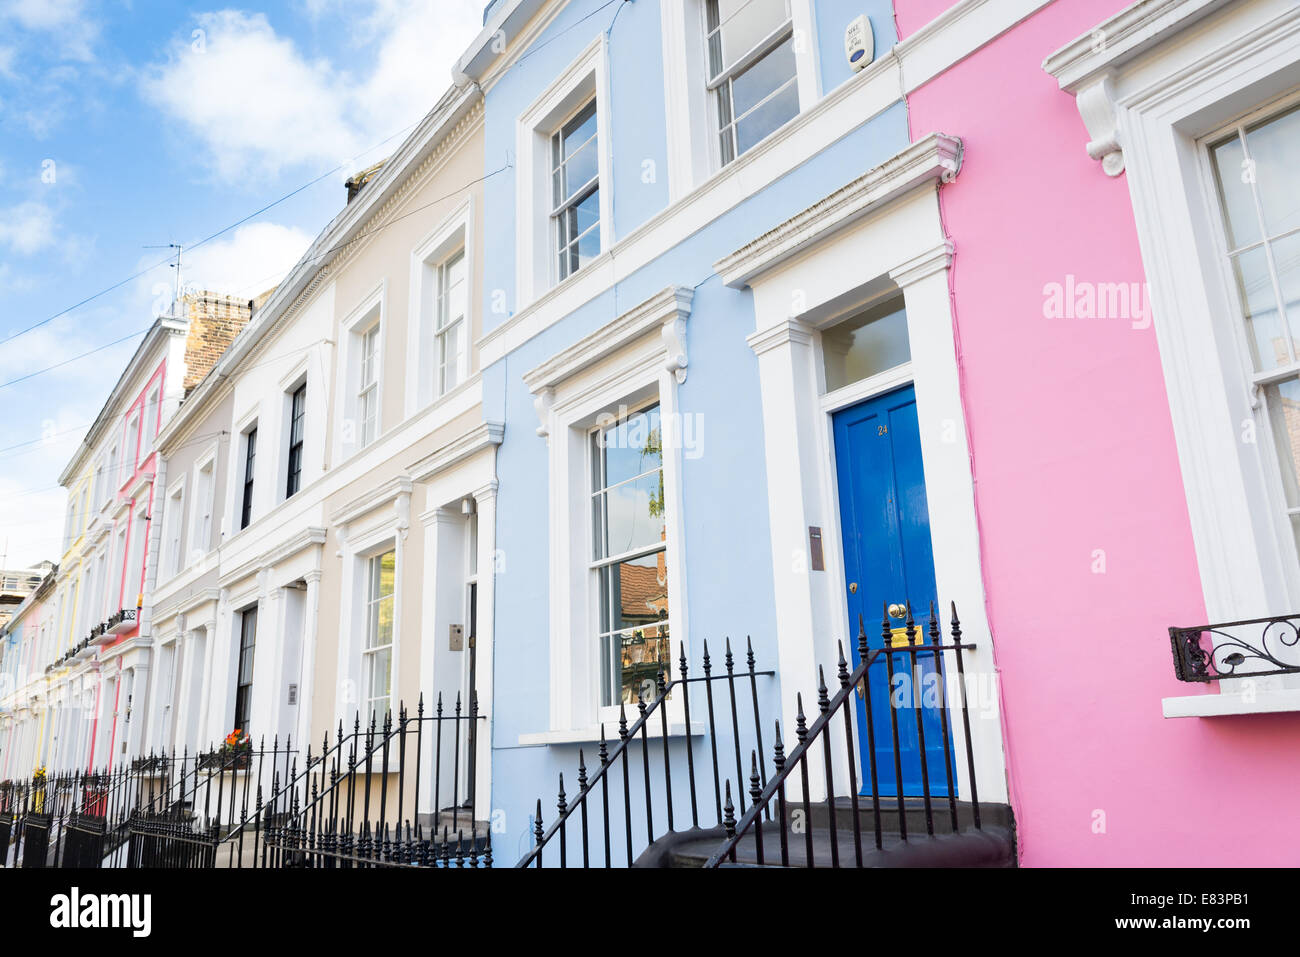 Reihe von Reihenhäusern in Notting Hill, London, England, UK Stockbild